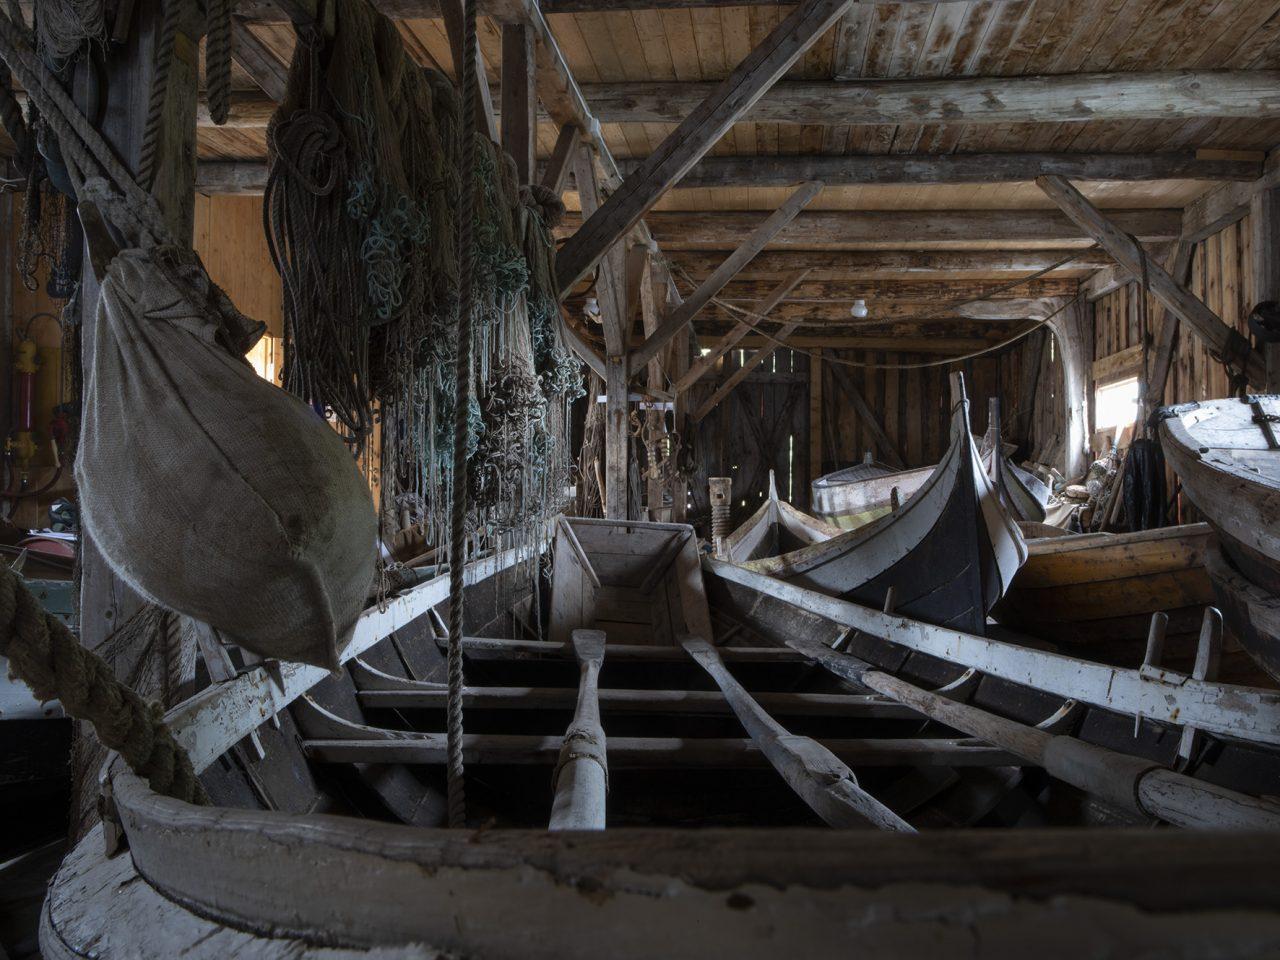 Båtutstilling på Falch gamle handelssted